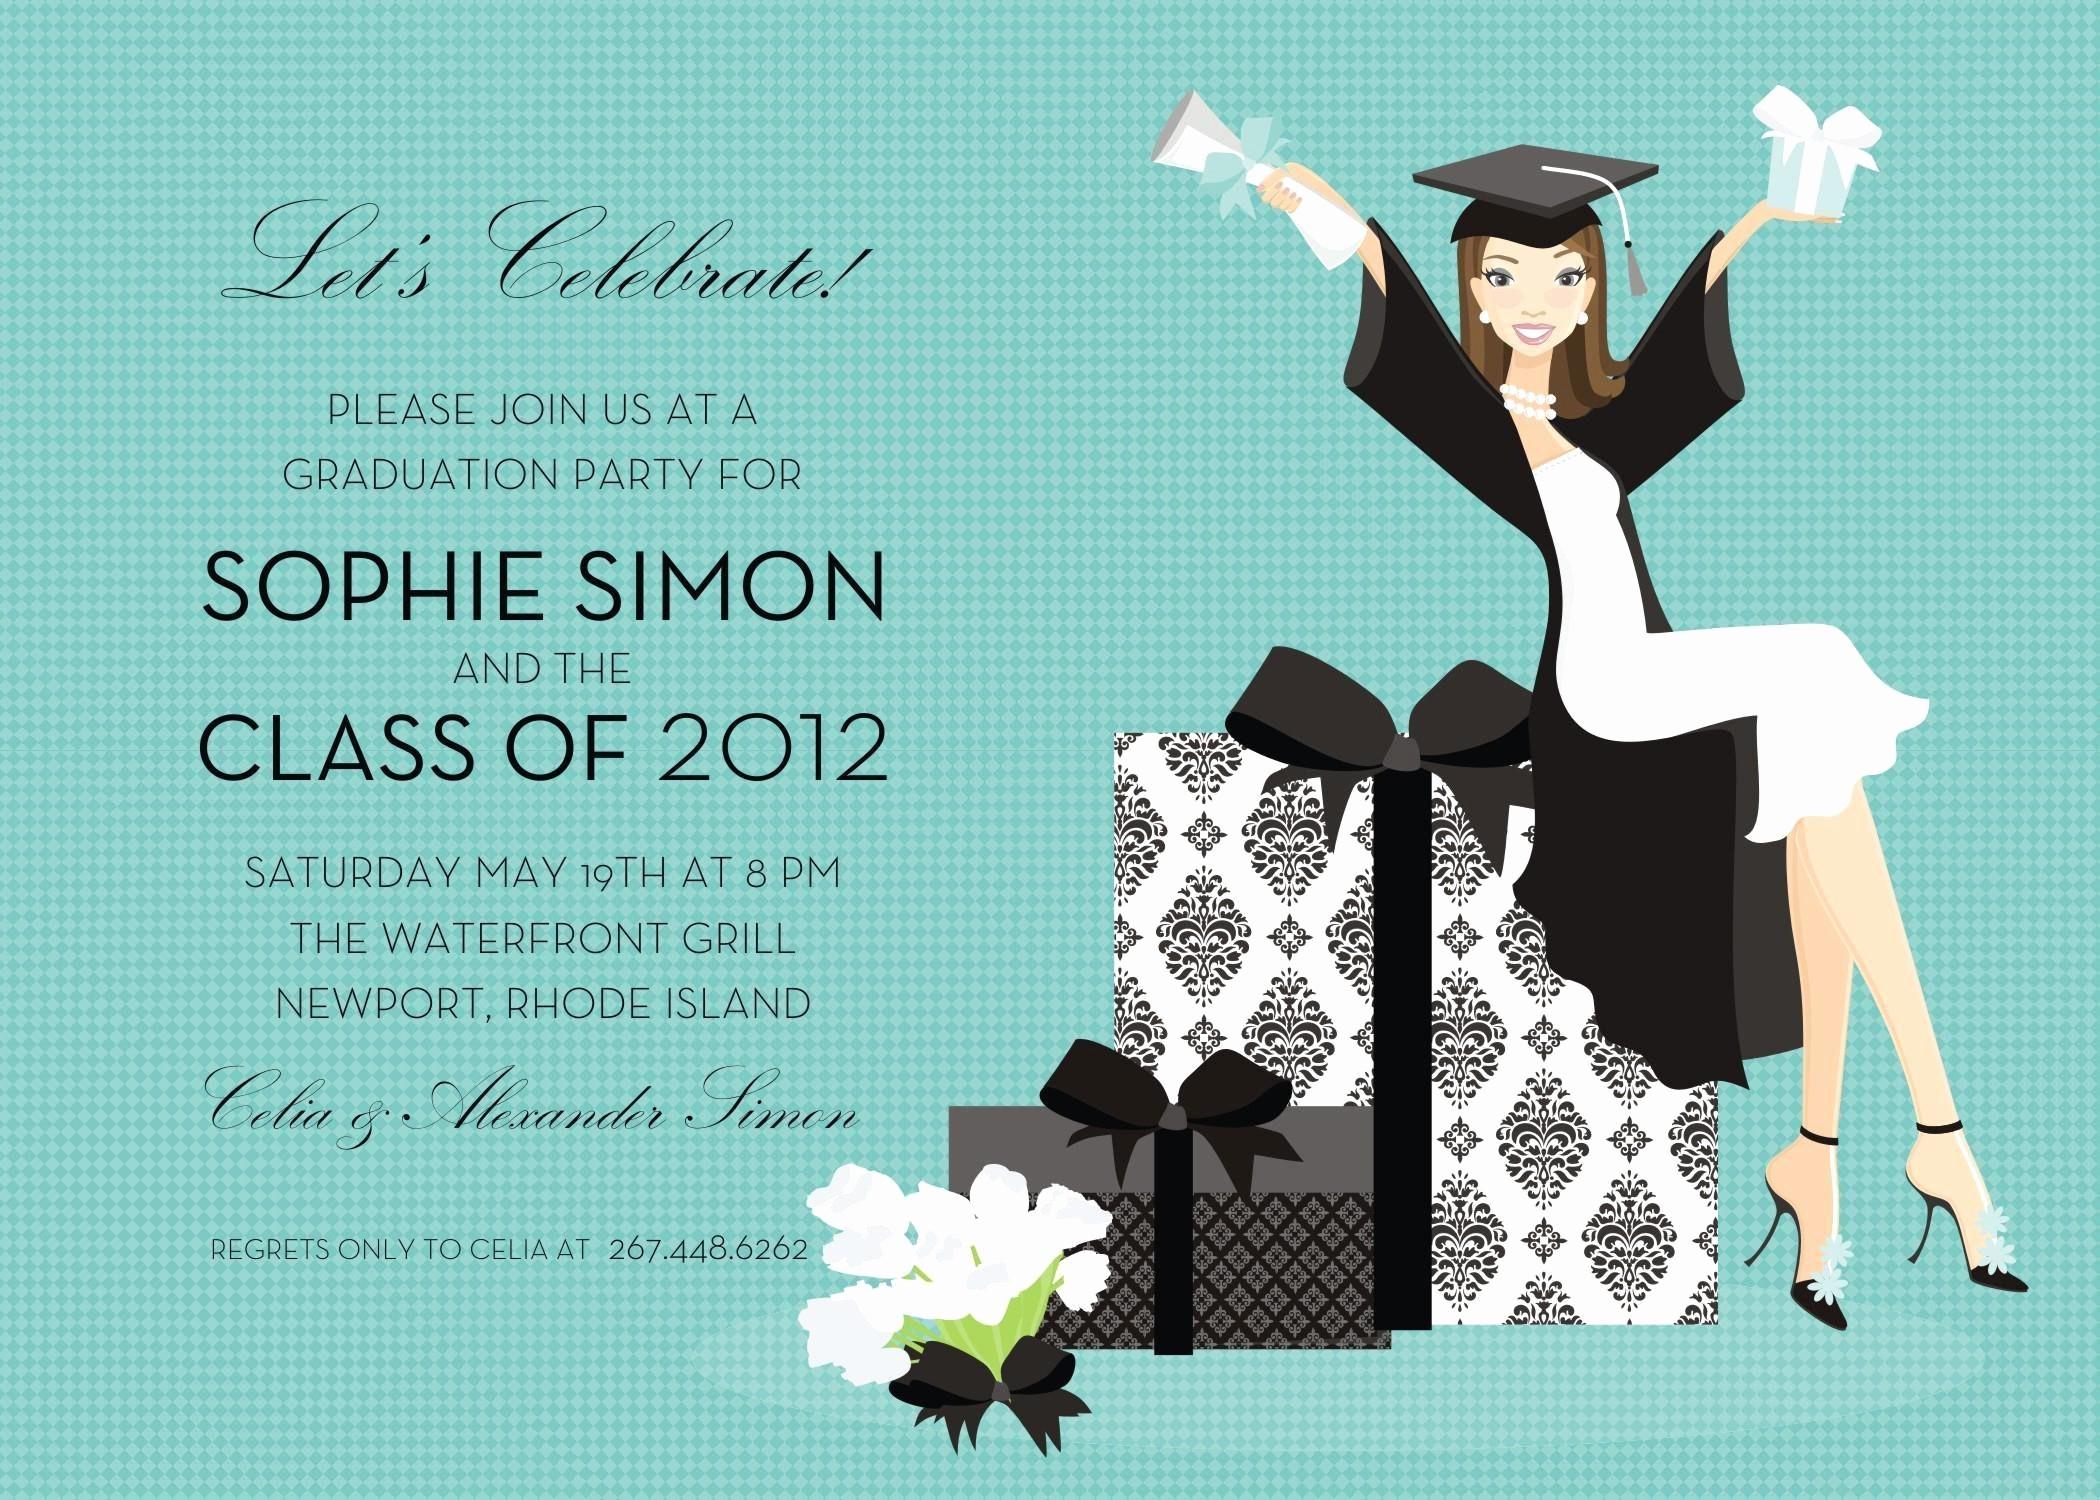 Free Graduation Party Invitations Templates Awesome Free Graduation Invitation Templates Free Graduation